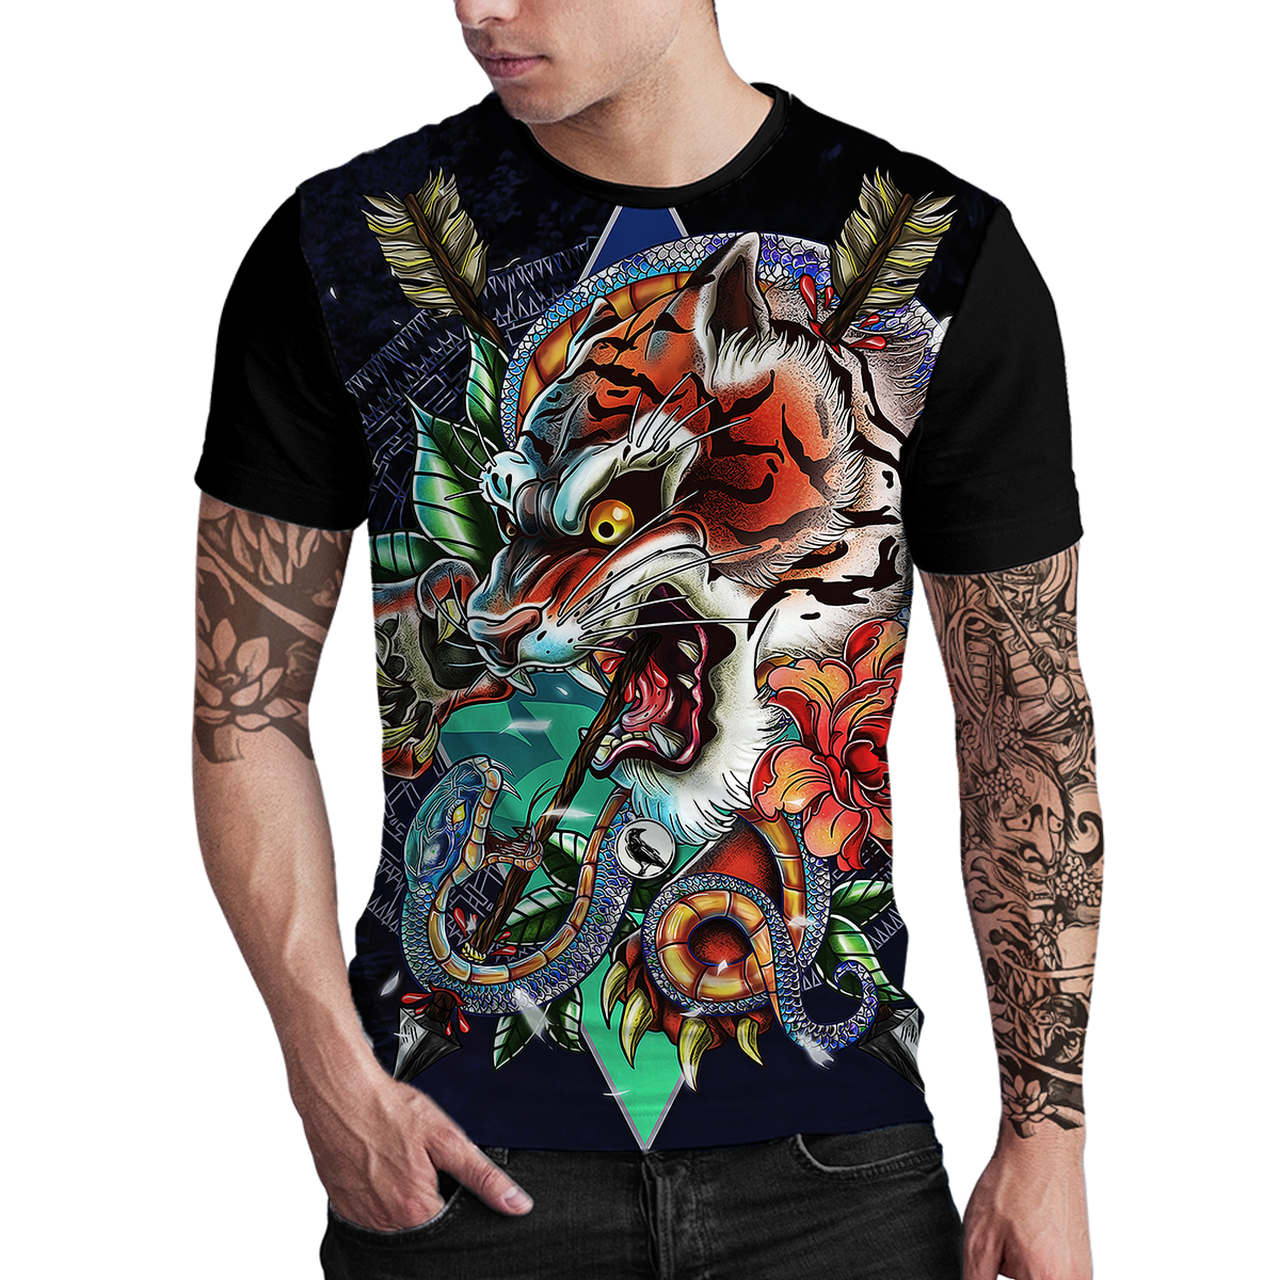 Stompy Camiseta Estampada Masculina Modelo 33